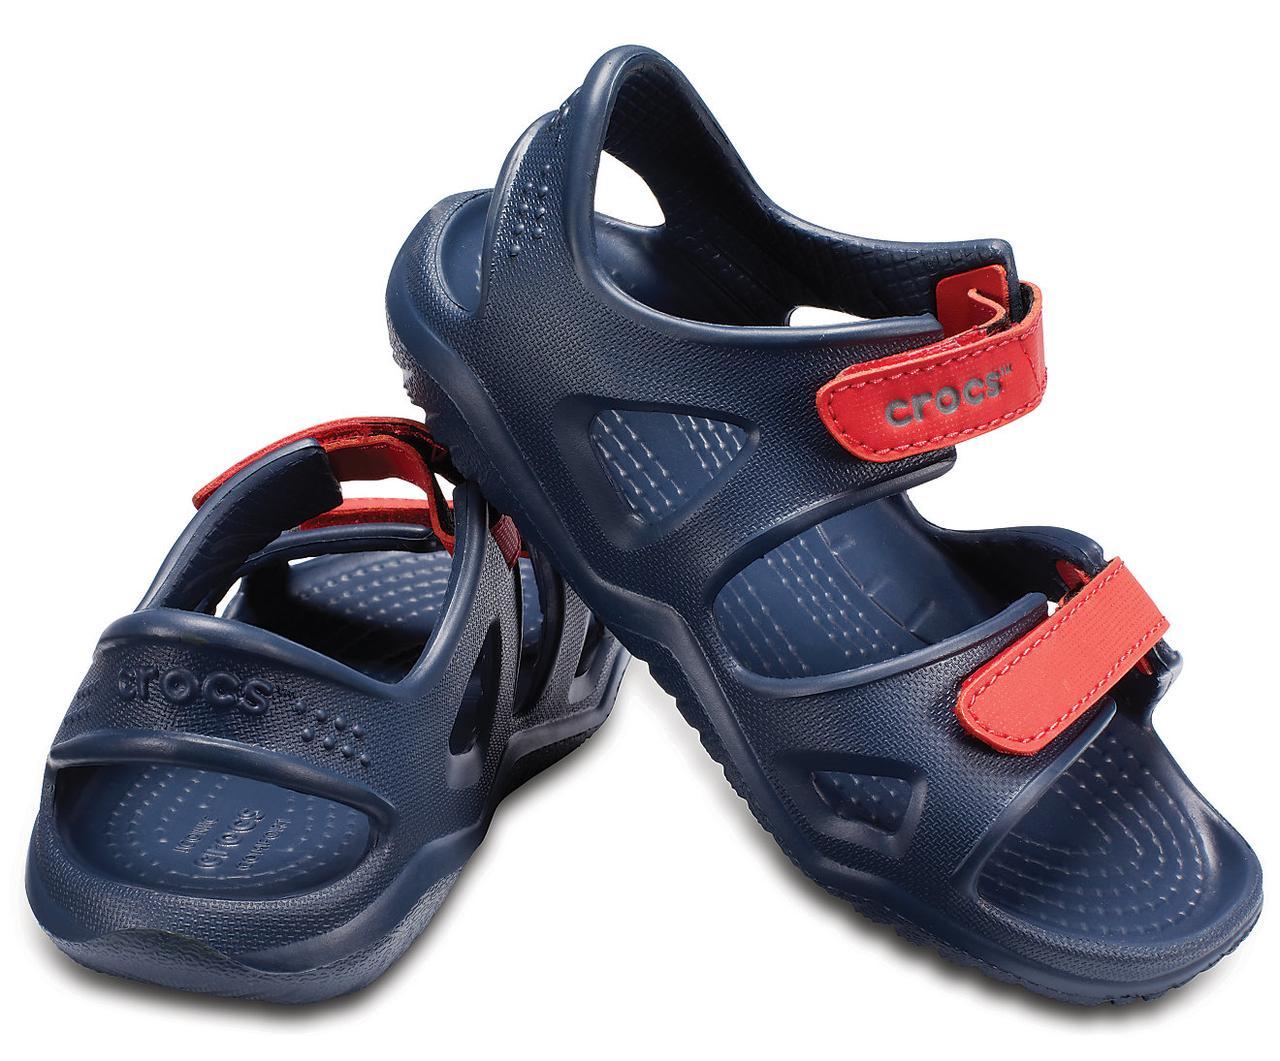 Босоножки сандалии для мальчика Кроксы оригинал / Crocs Kids' Swiftwater River Sandal (204988), Темно-синие